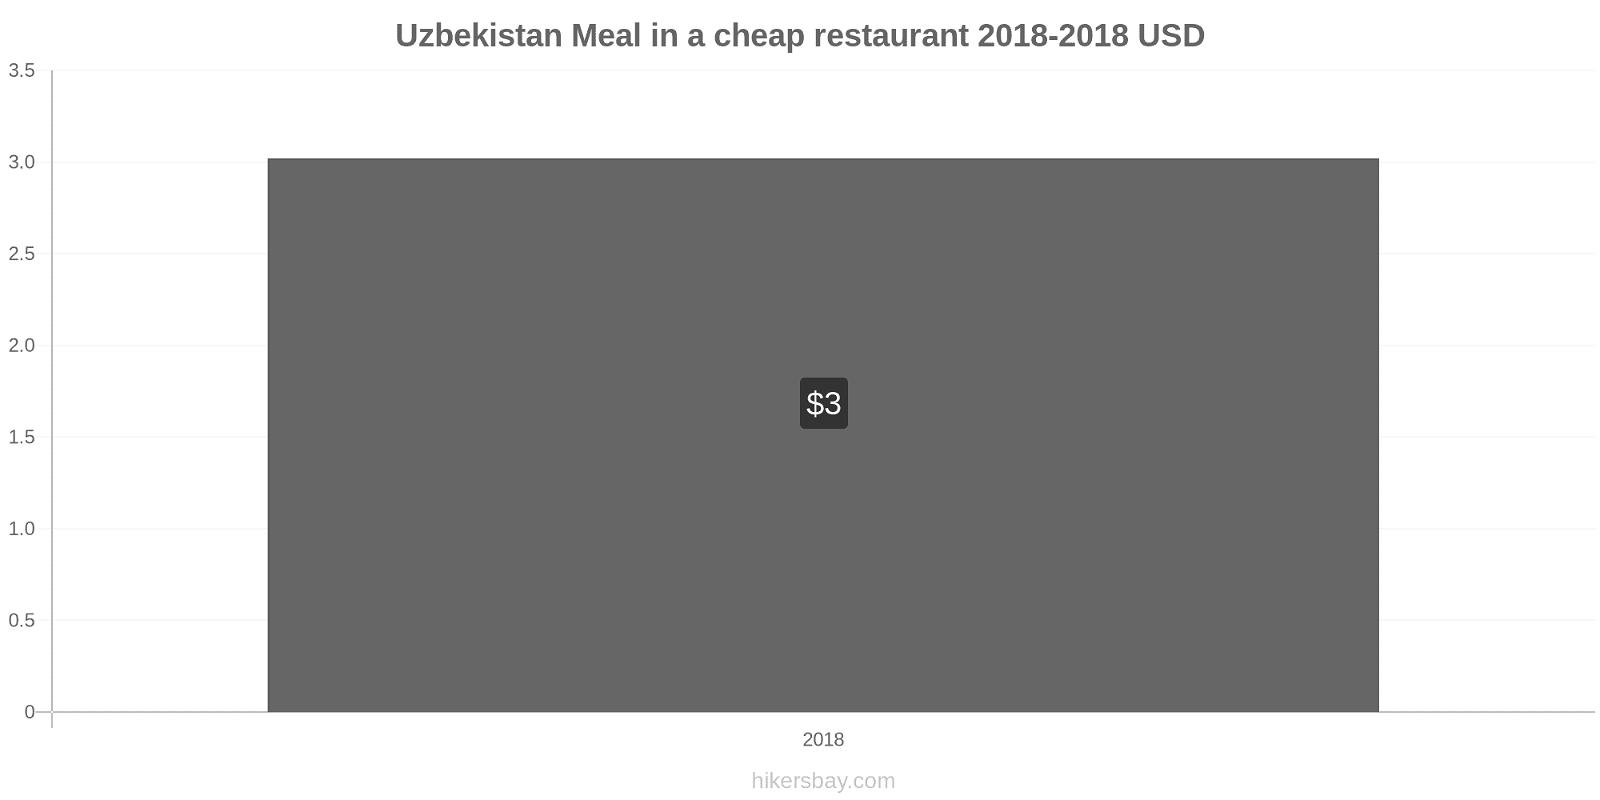 Uzbekistan price changes Meal in a cheap restaurant hikersbay.com